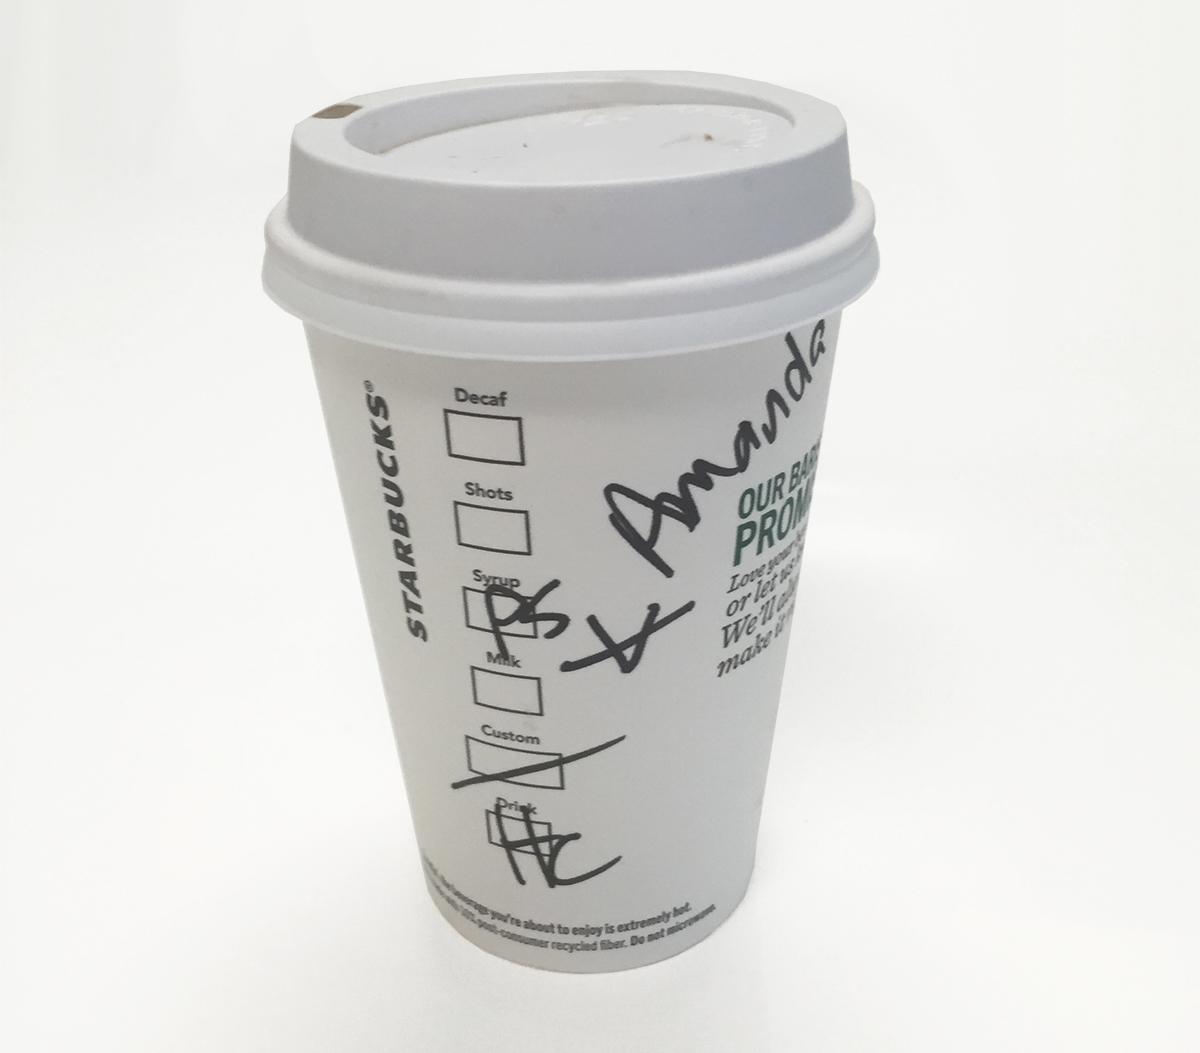 Starbucks pumpkin spice hot chocolate cup